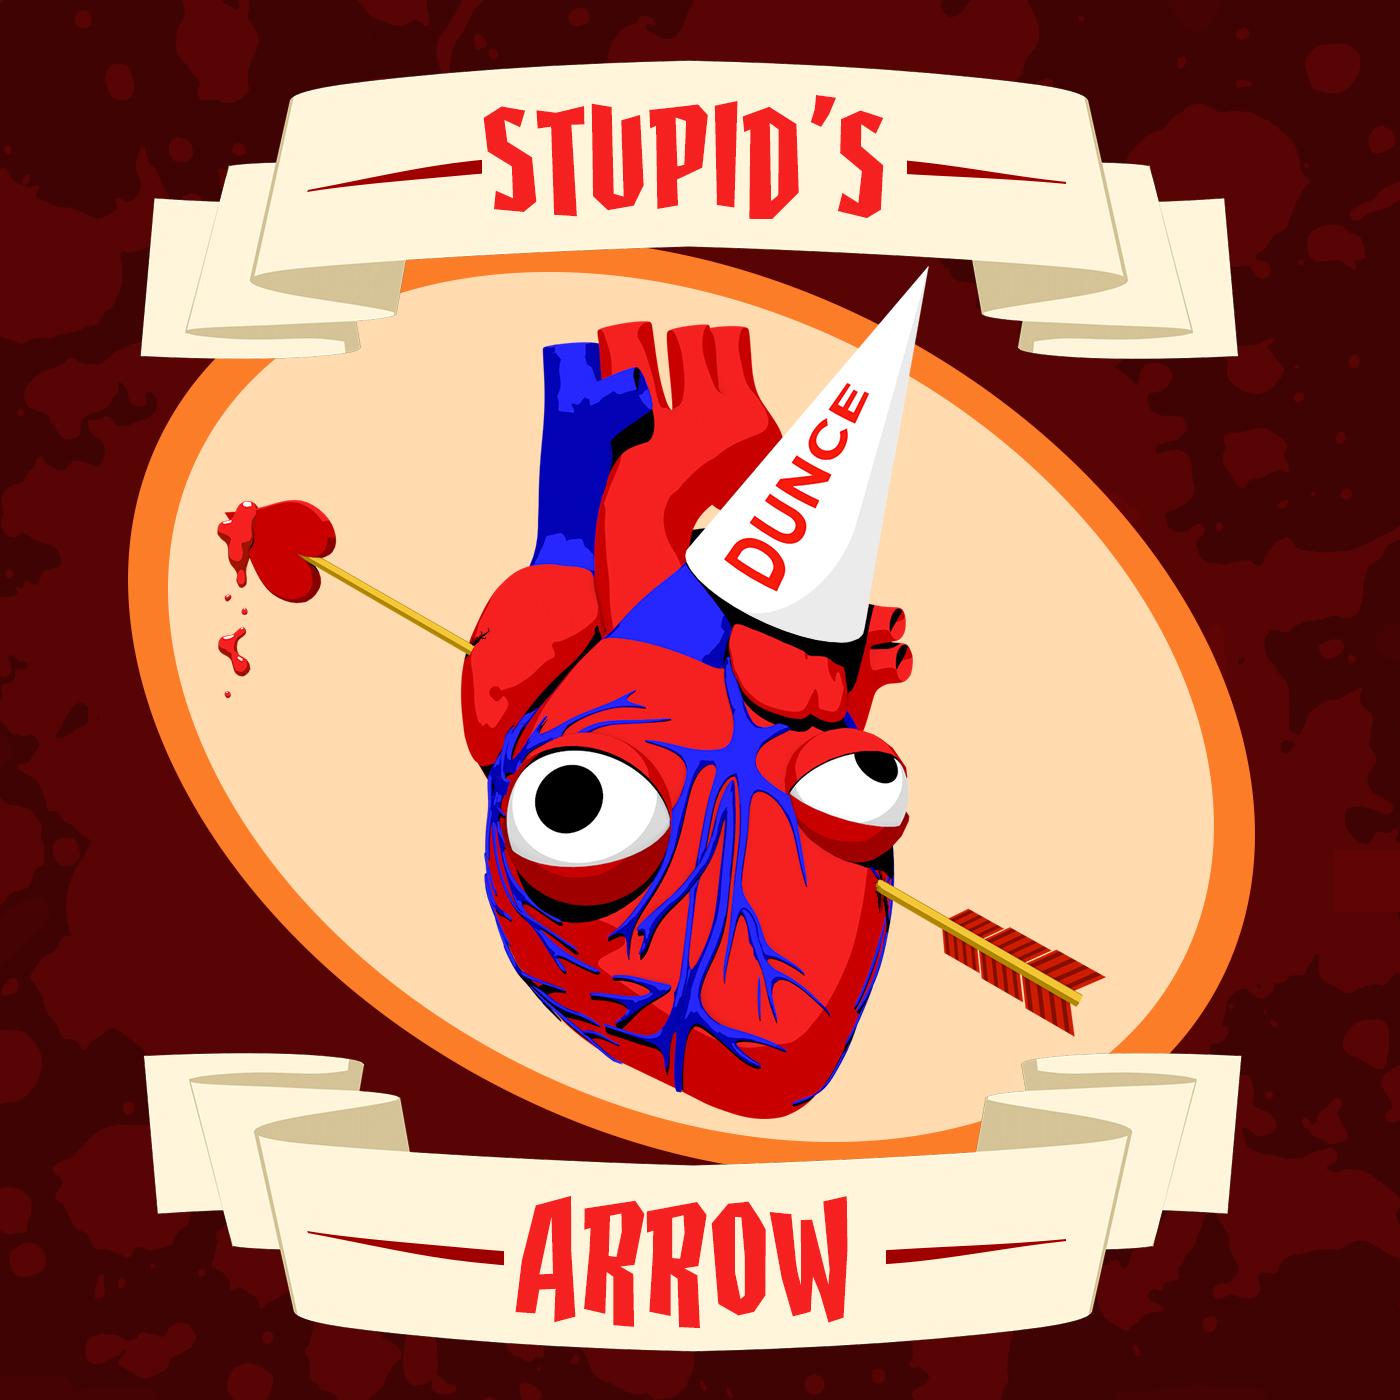 StupidsArrow.jpg